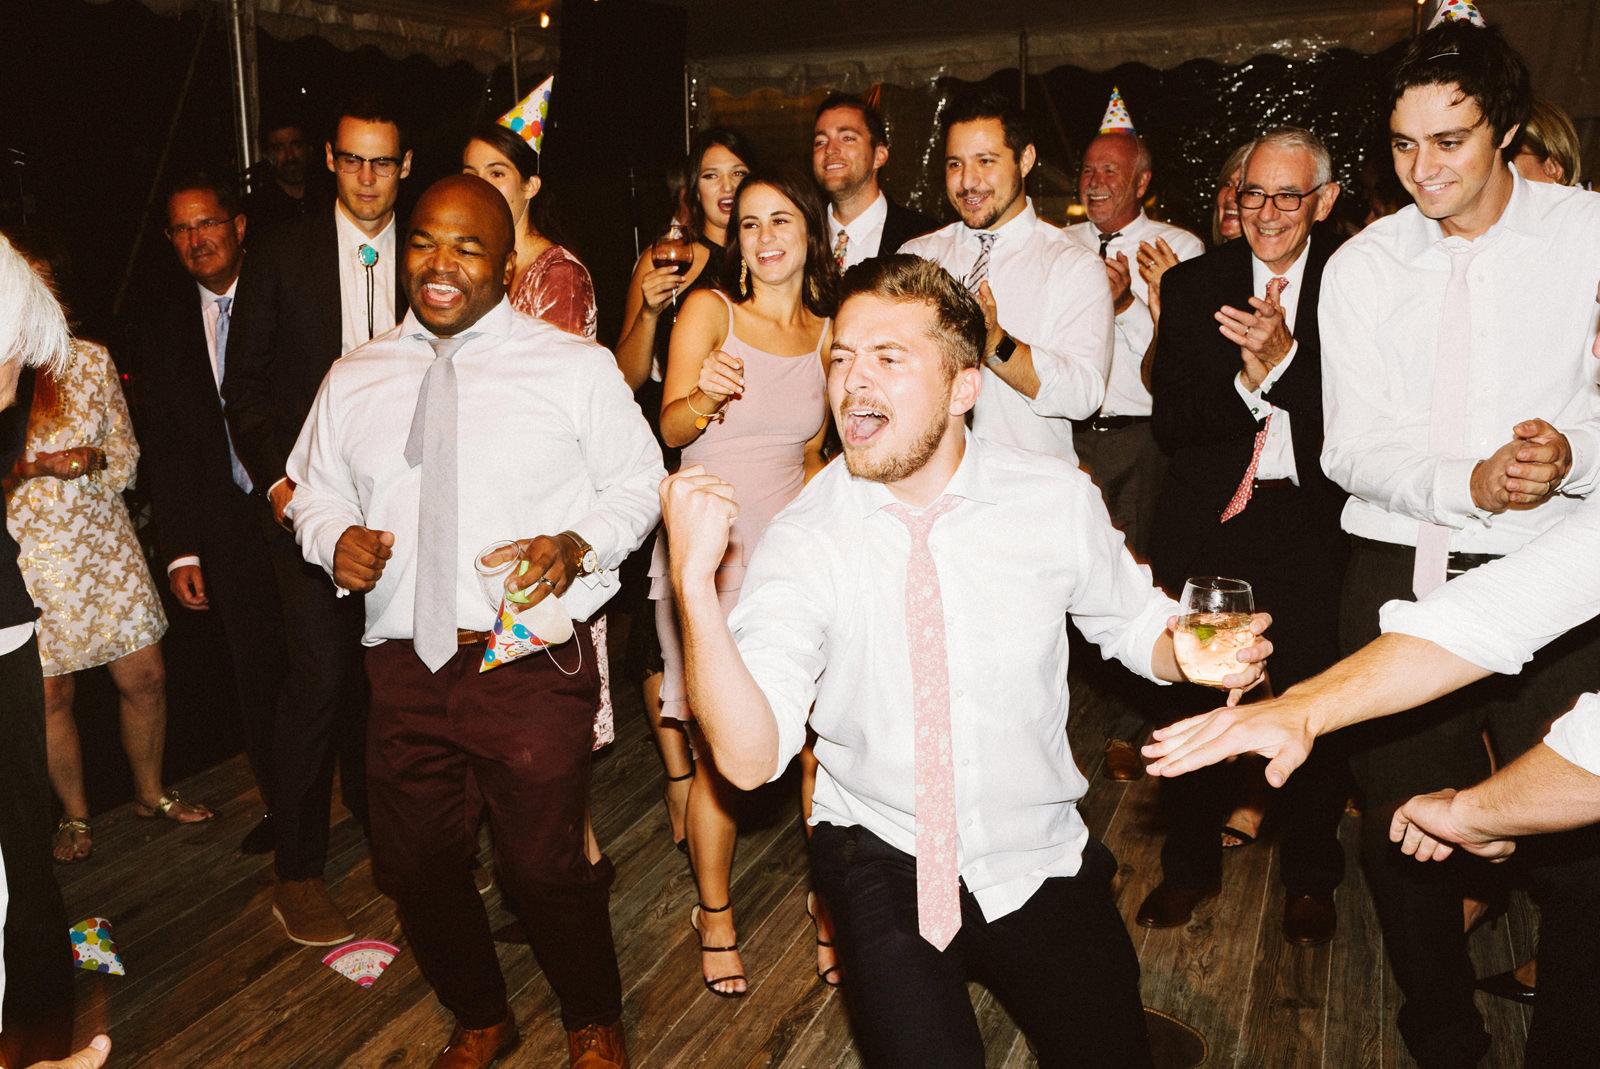 bridgeport-wedding-165 BRIDGEPORT, CONNECTICUT BACKYARD WEDDING